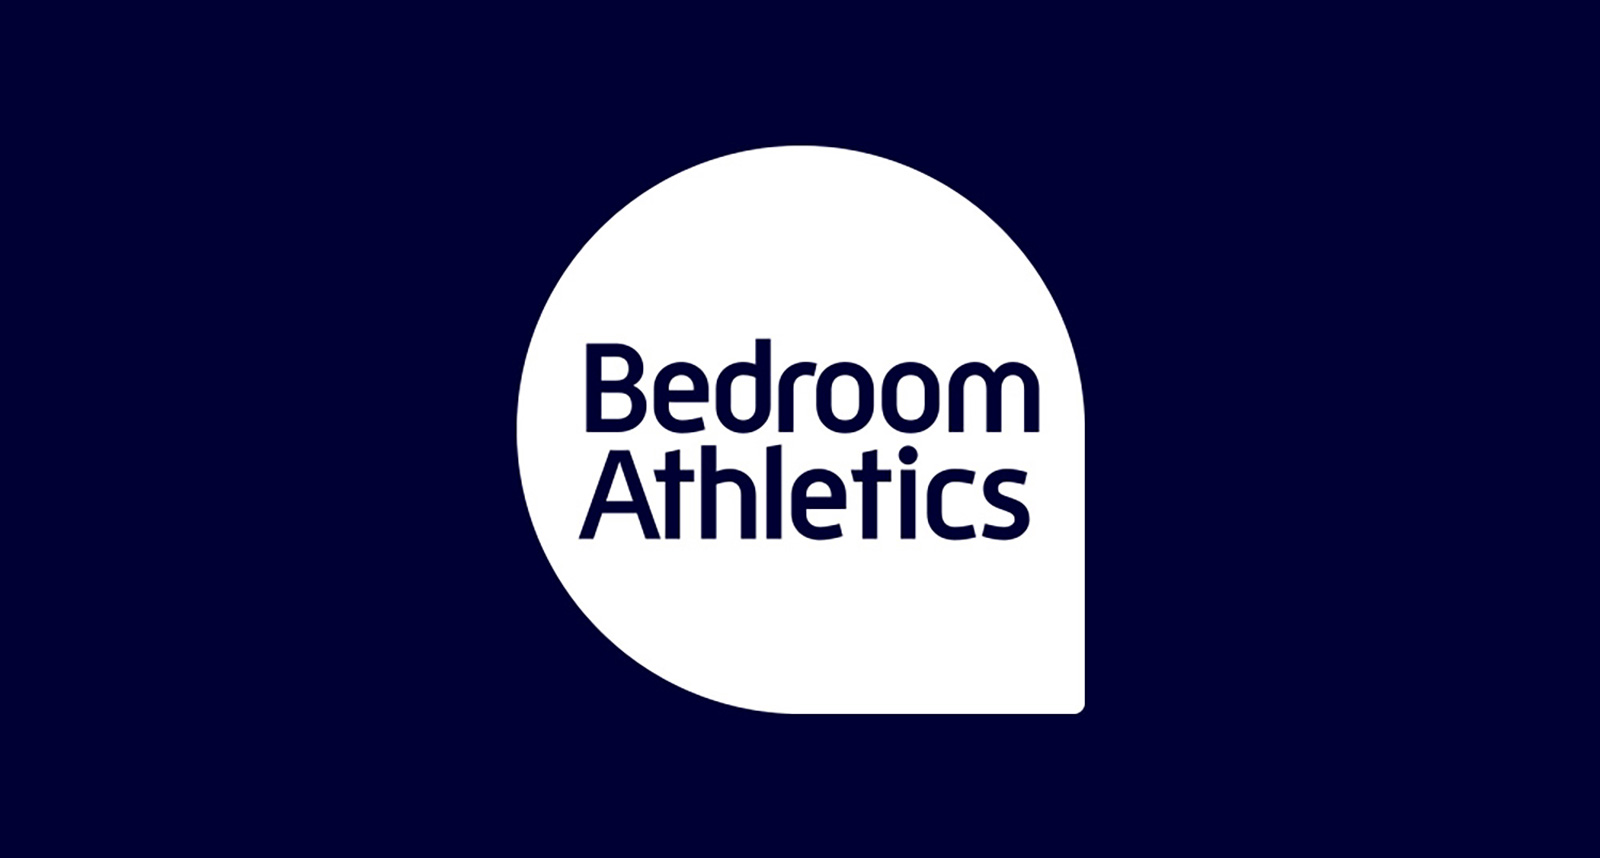 Bedroom Athletics Design